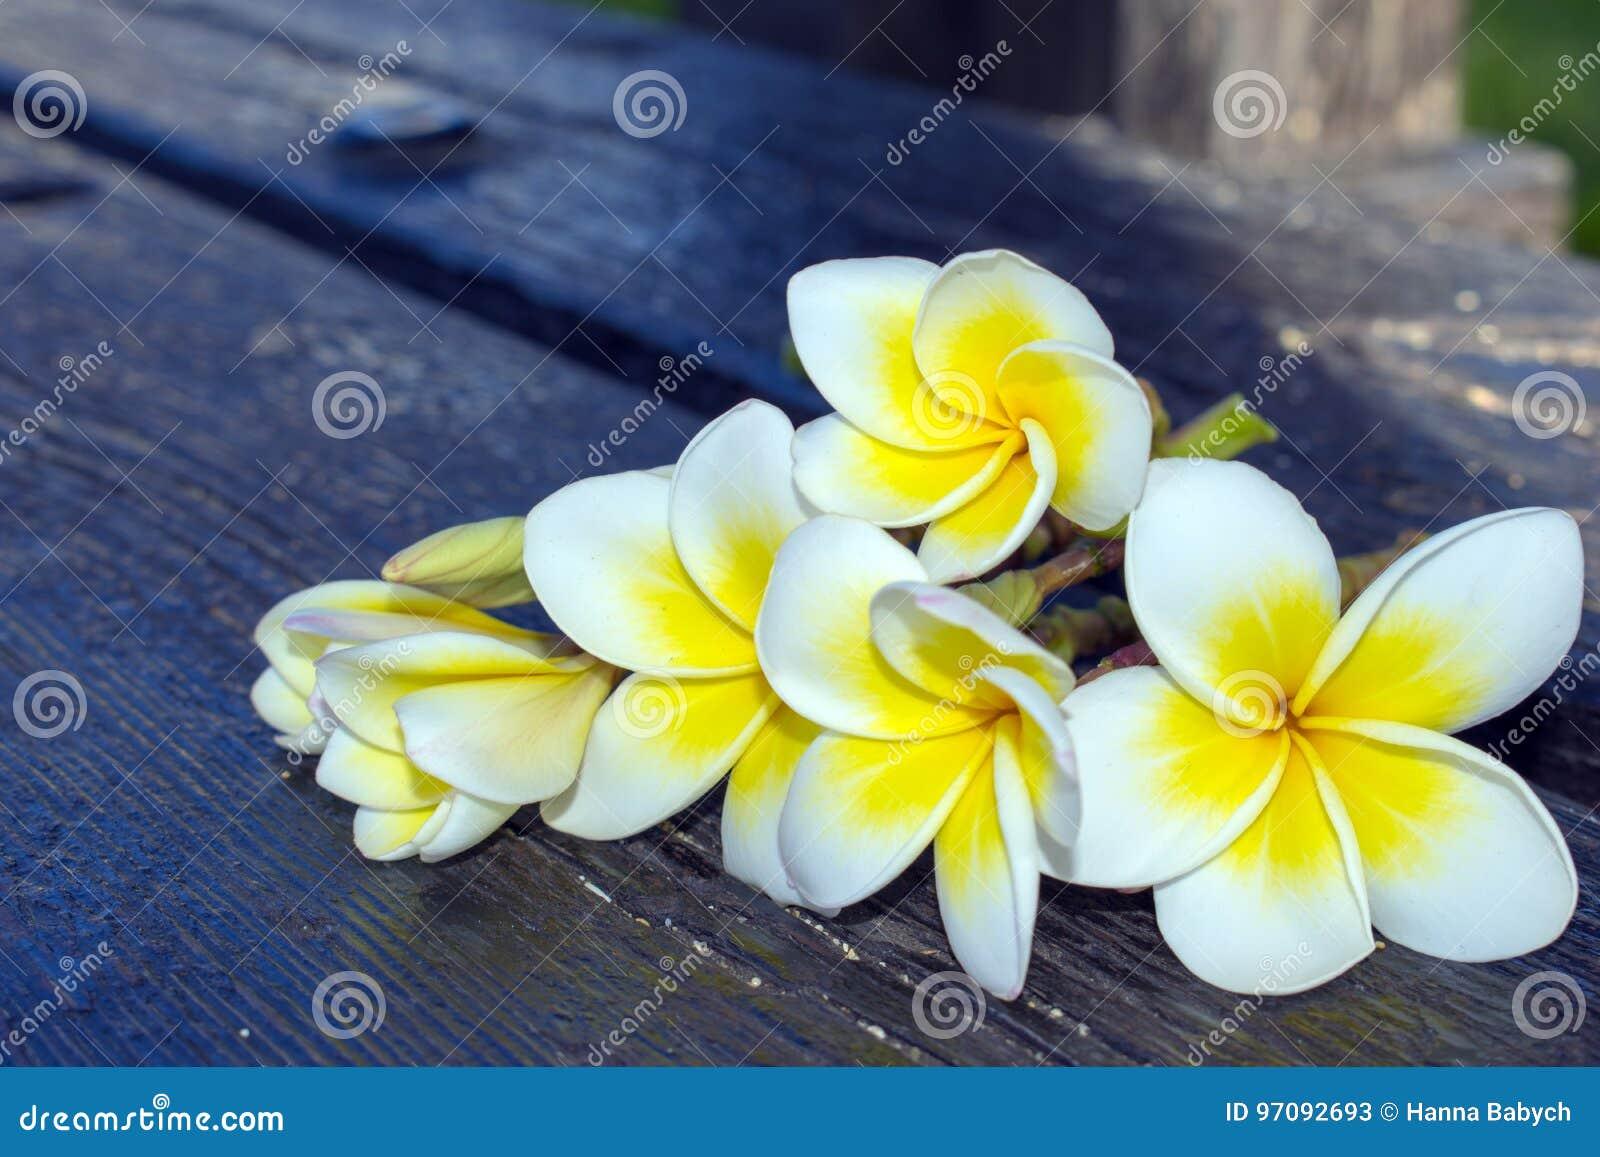 White Tropical Flowers Plumeria On A Dark Background Stock Image